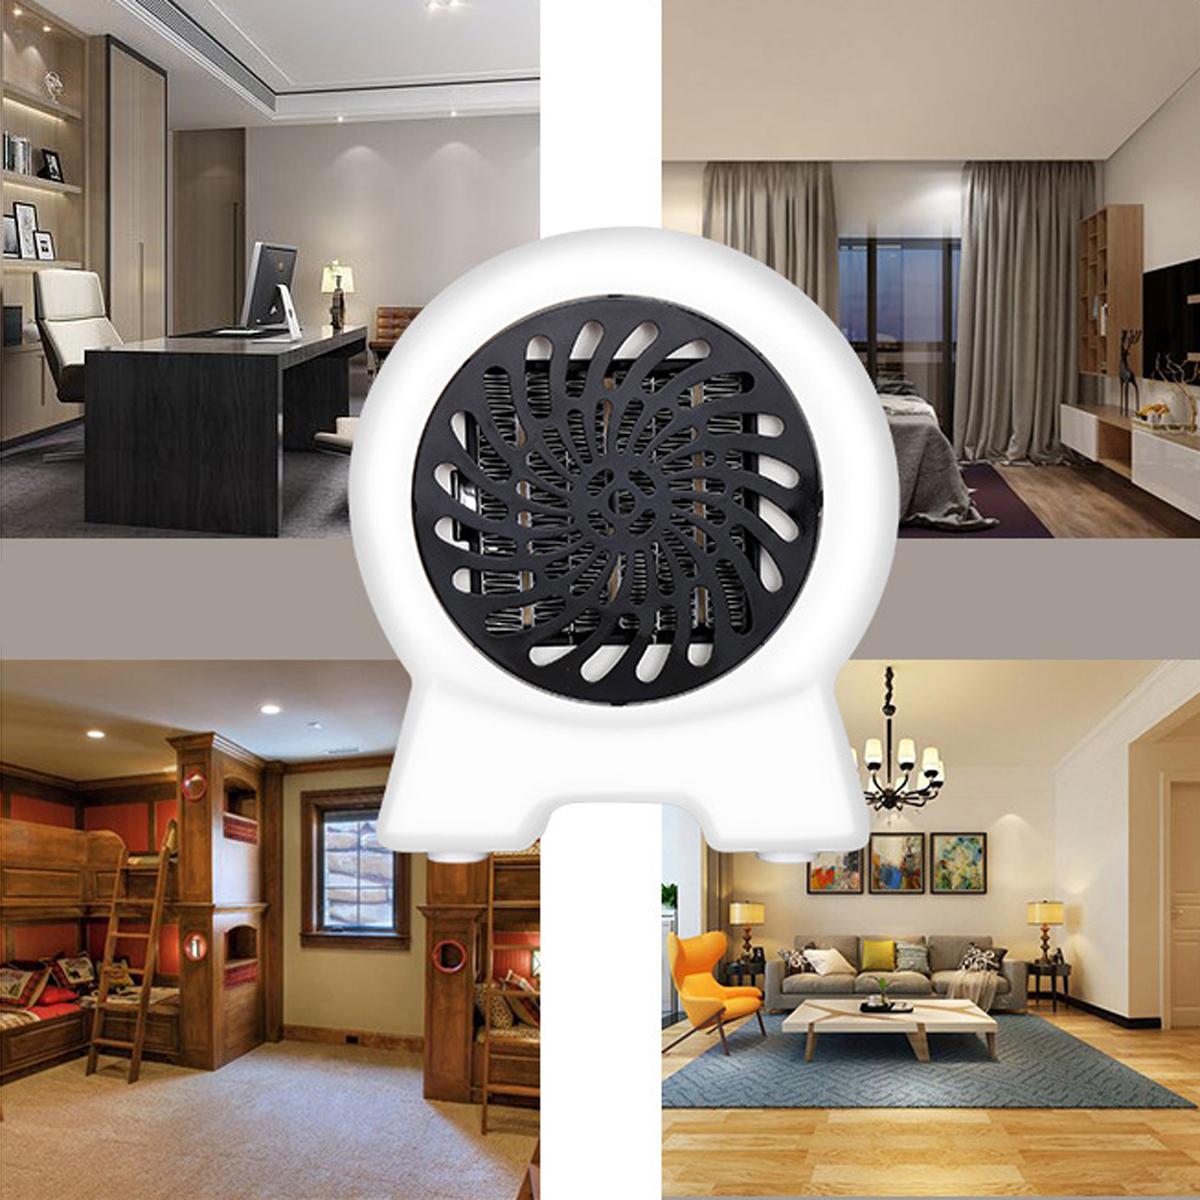 Mini Desktop Heater Household Electric Heating Office Foot Warmer Dormitory Heater Electric Heater